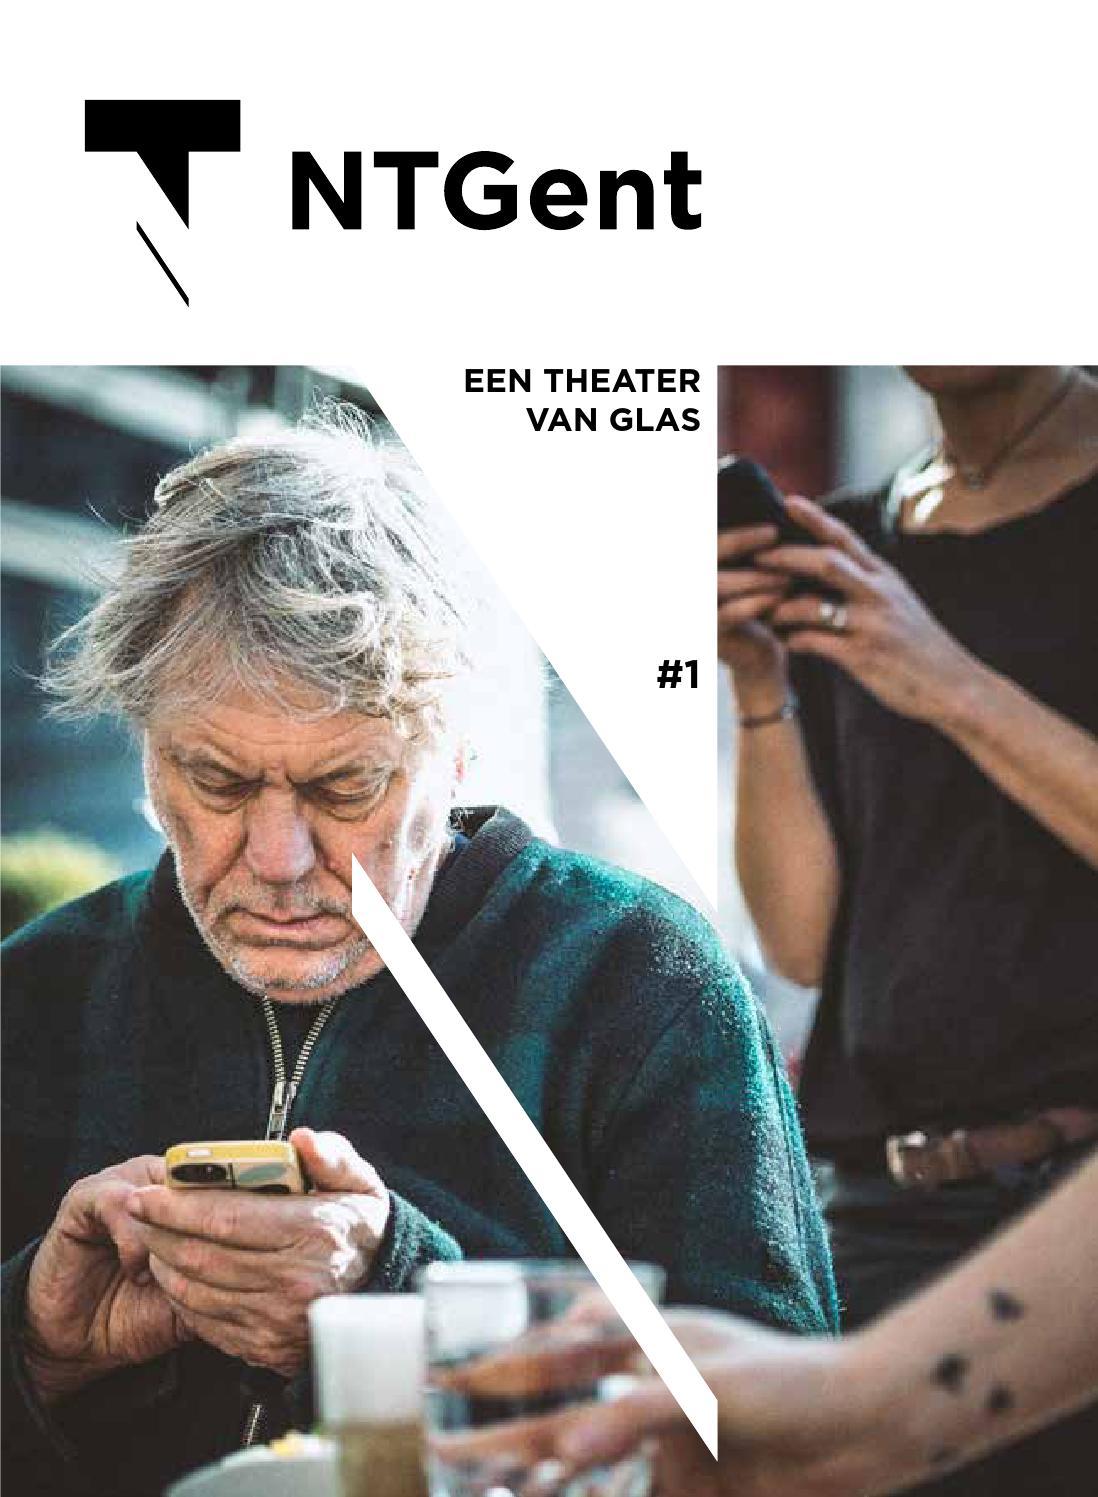 Seizoensbrochure 2016 2017 by ntgent   issuu